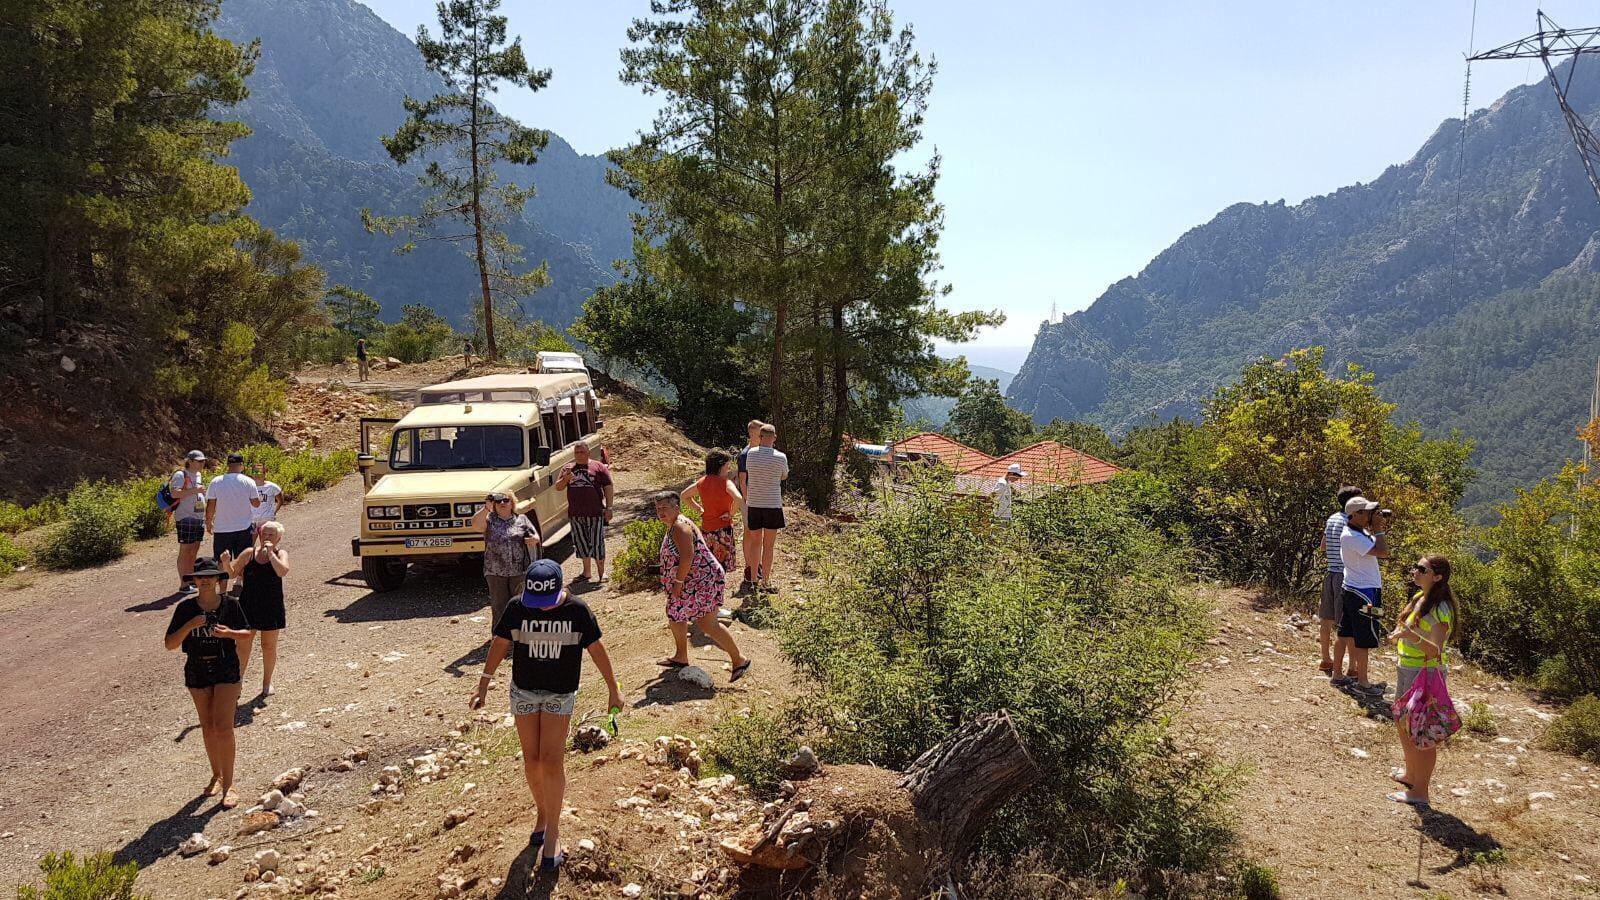 Экскурсия в Гейнюк каньон на джипах